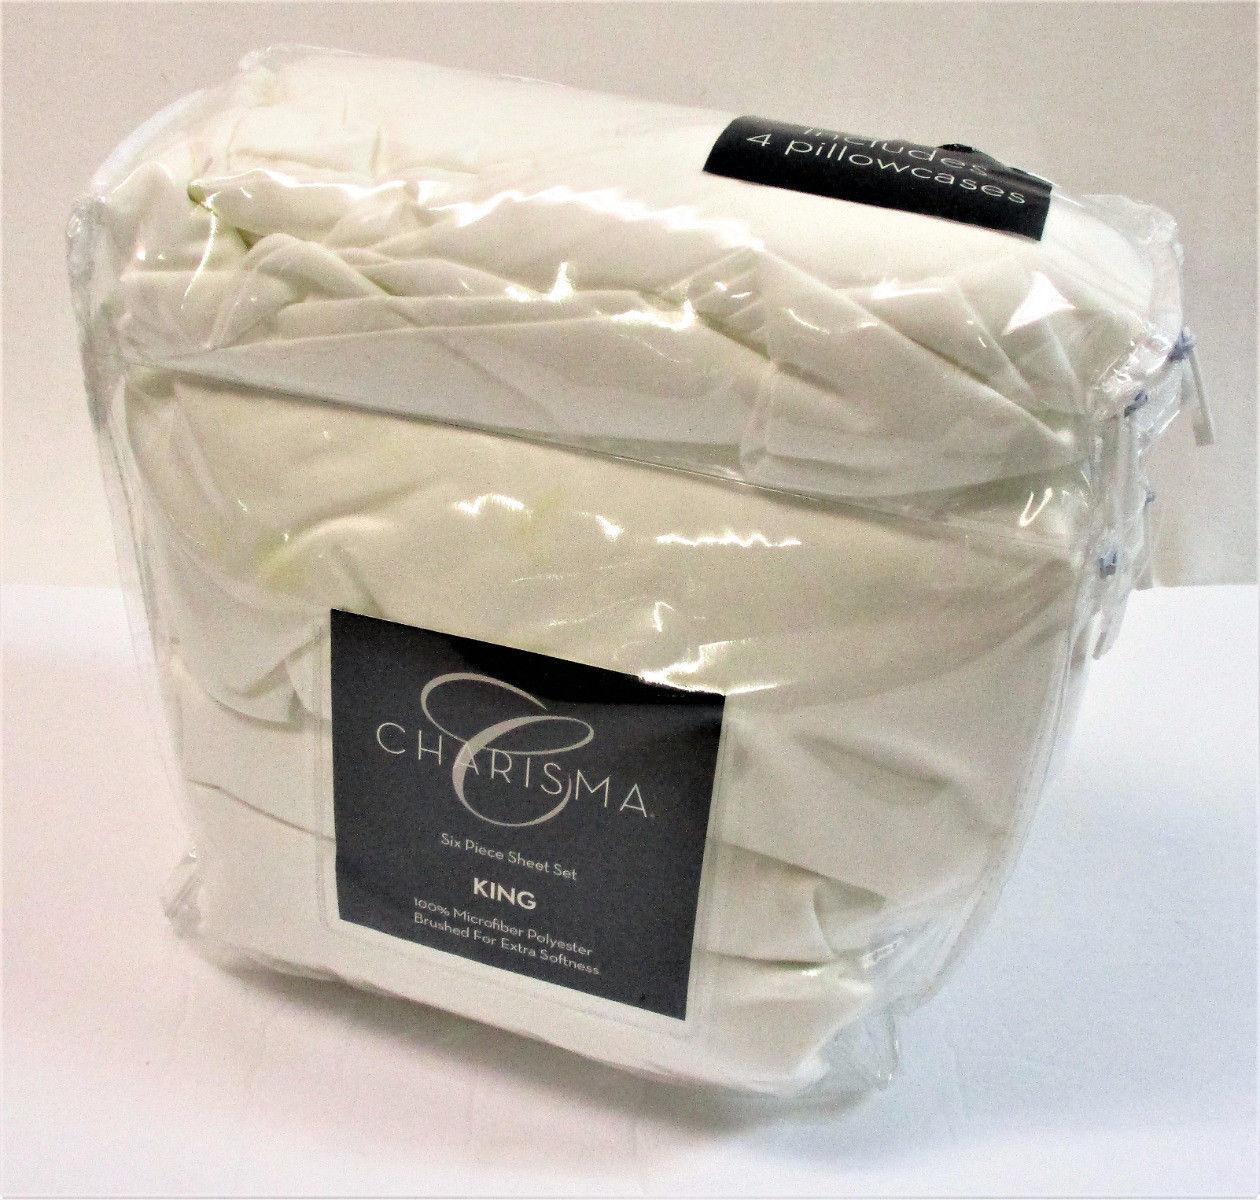 Costco Charisma Sheets White: Charisma KING 6 Pc Sheet Set